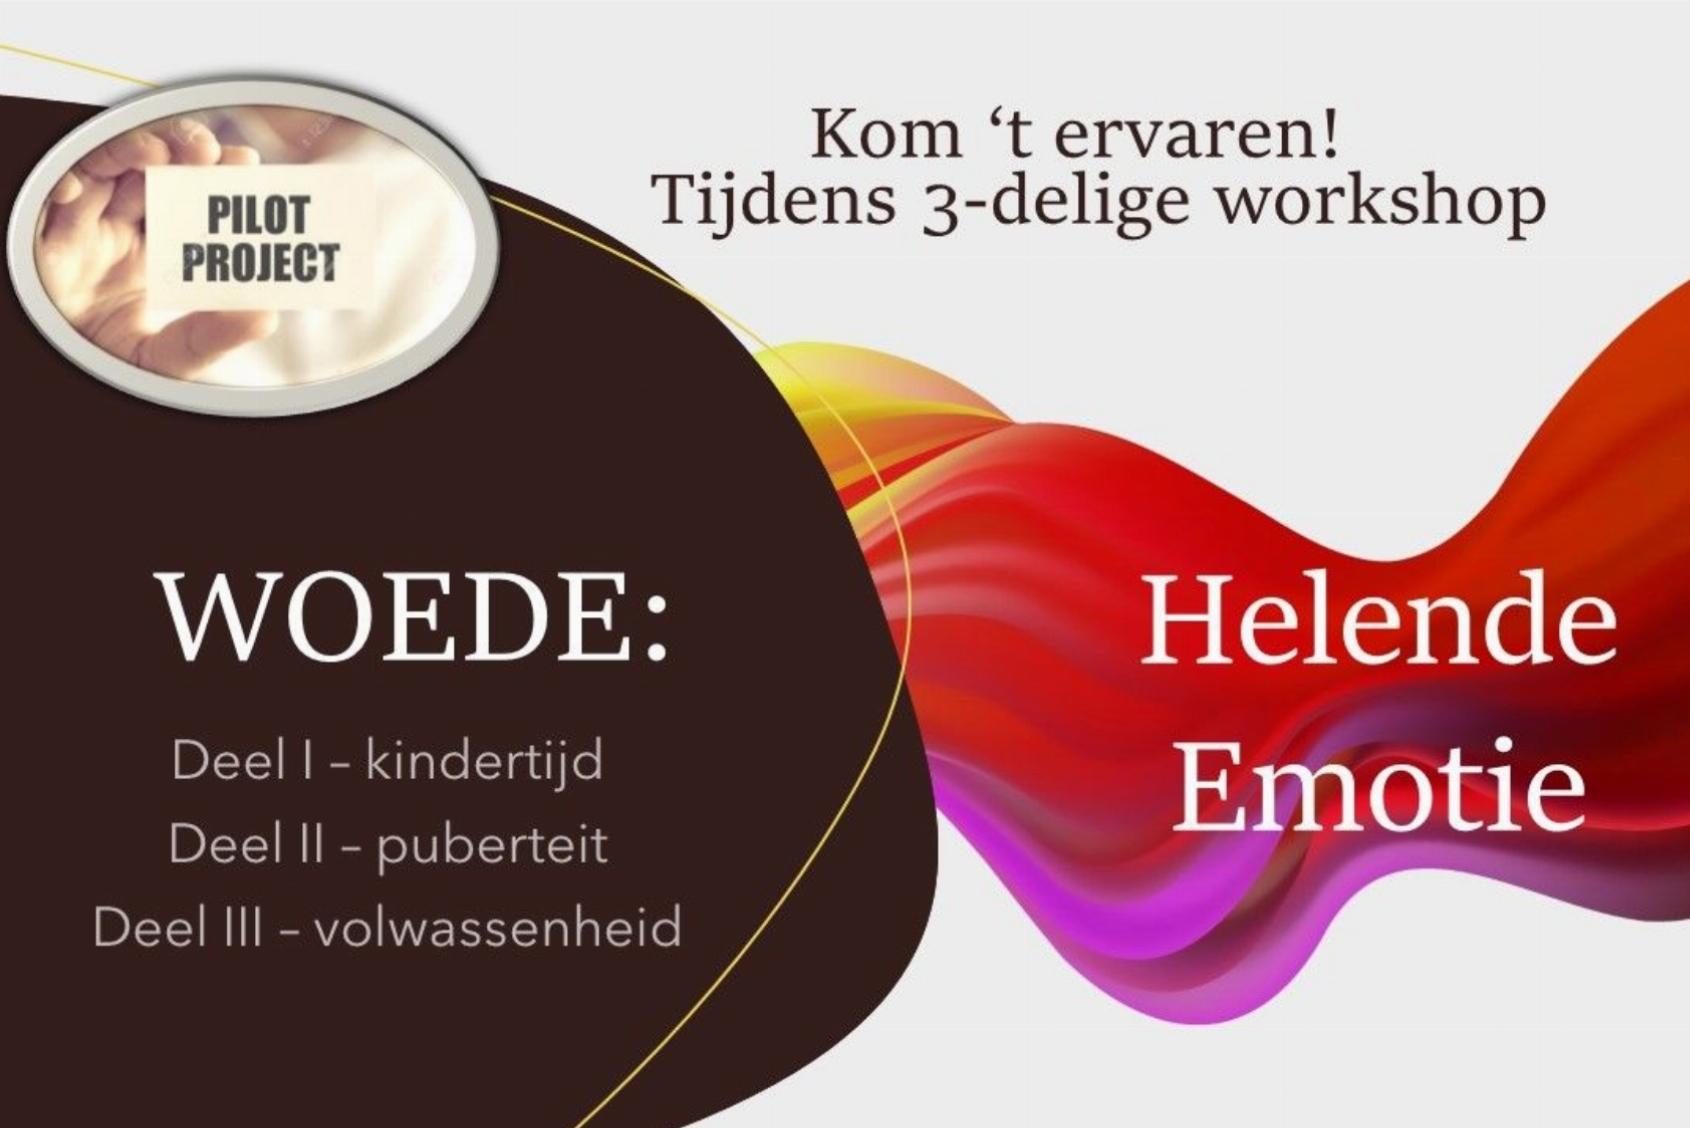 3-delige workshop WOEDE: Helende Emotie